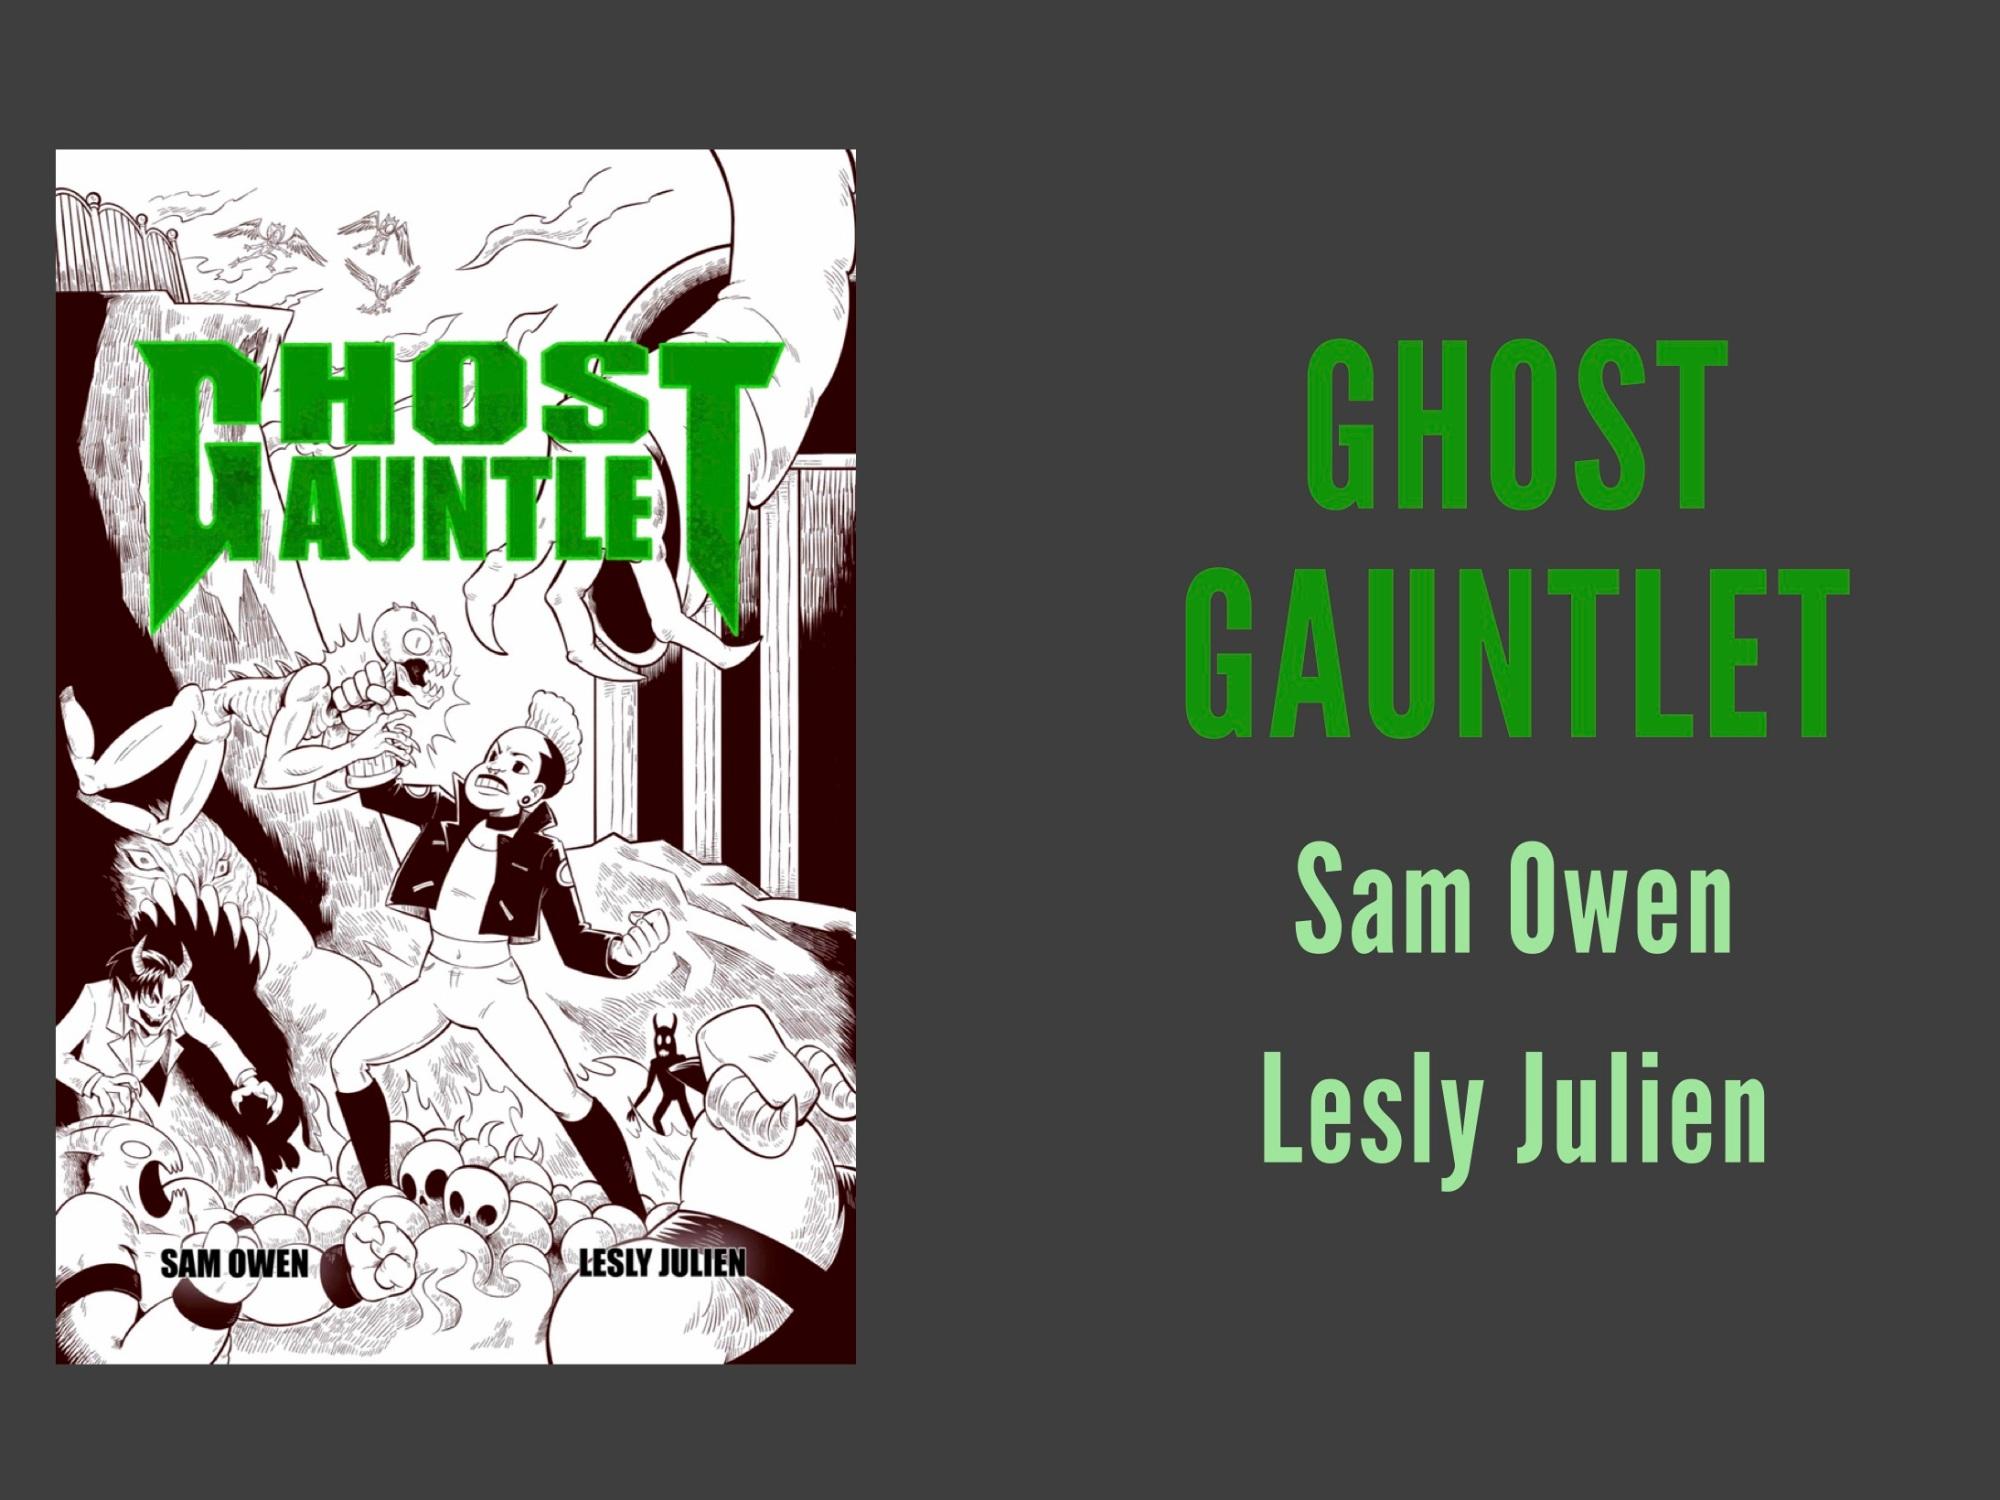 Ghost Gauntlet Featured